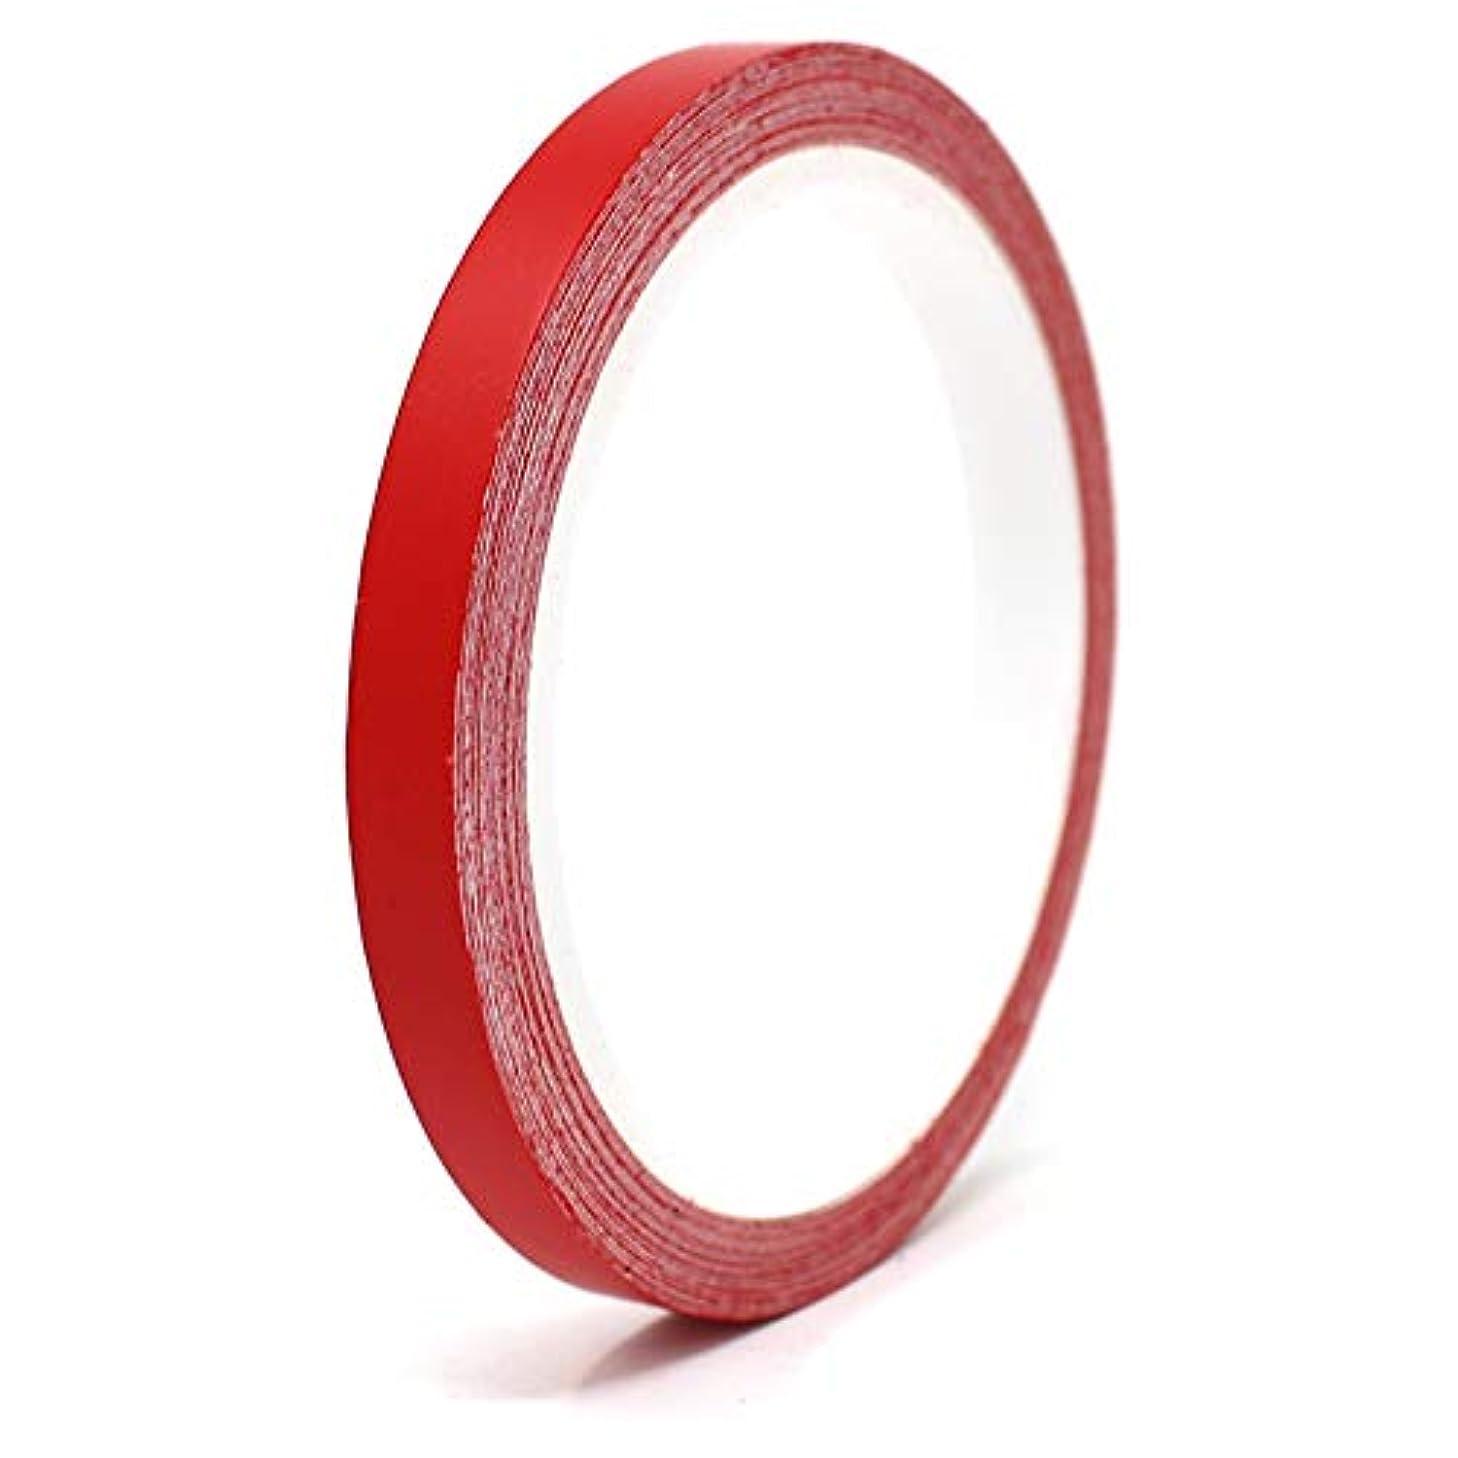 Finest Folia Oracal Vinyl Stripe Tape 751 Pinstripes Striping Sticker 33ft (Red Matt, 0,315